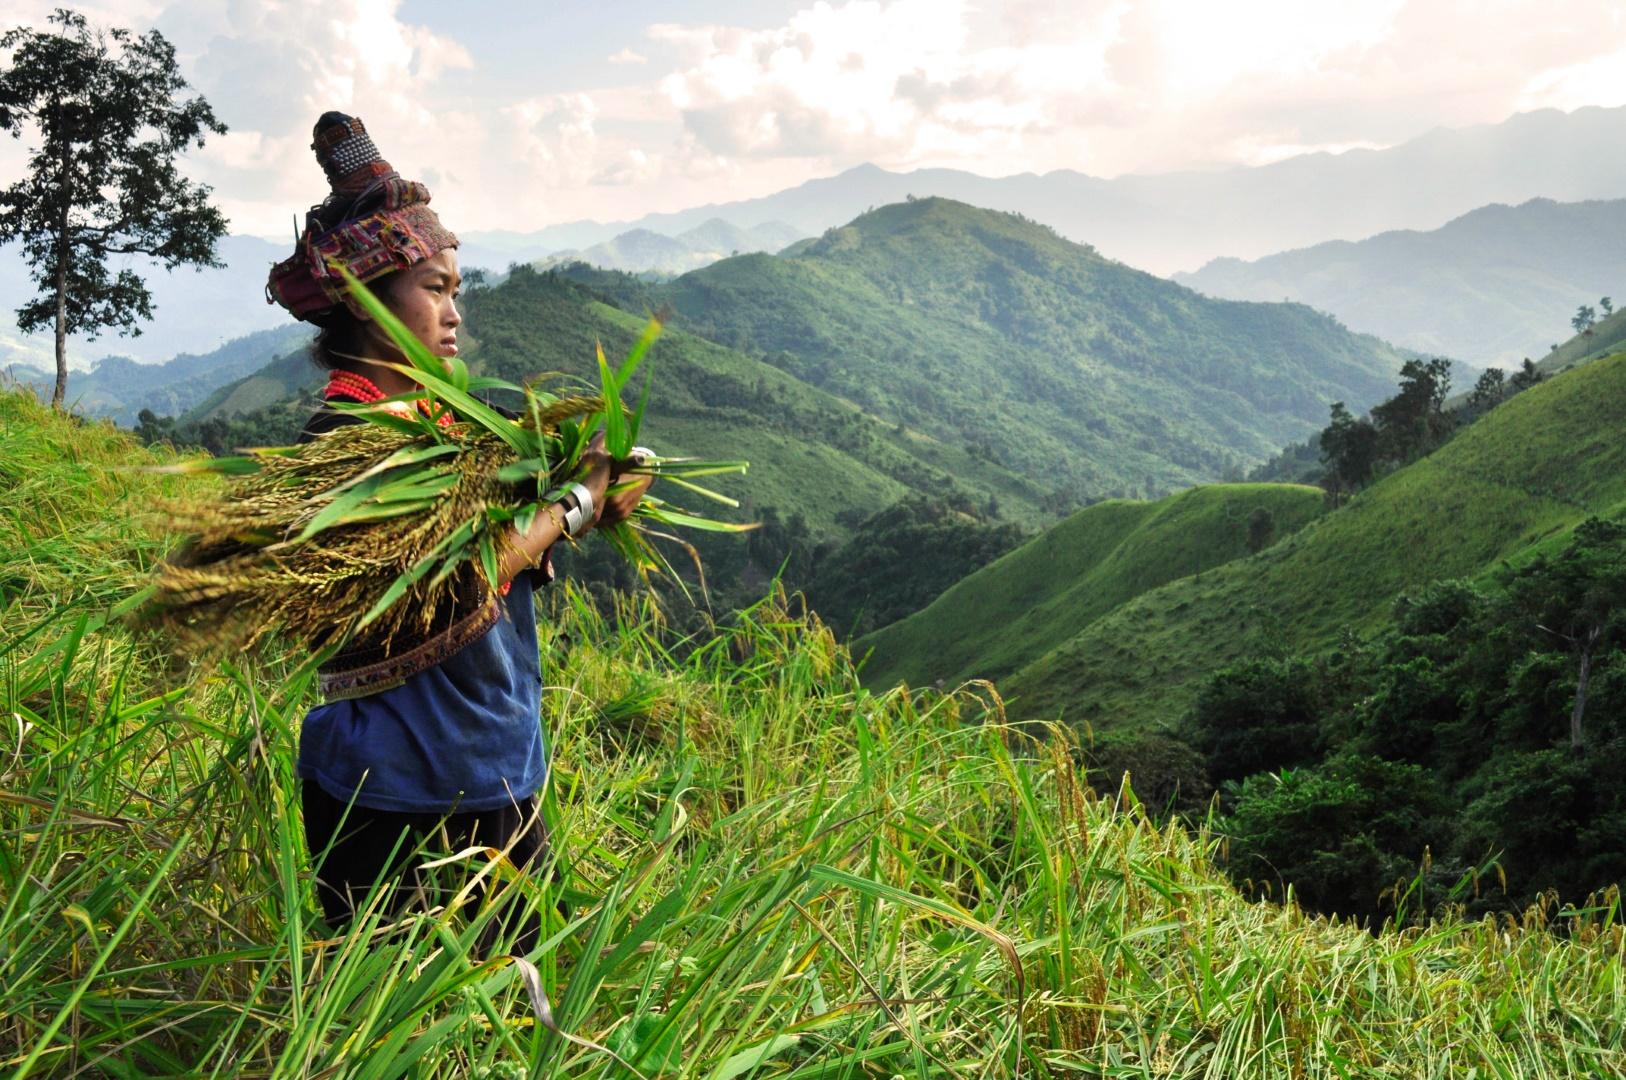 laos-muang-khua-akha-field-landscape-dsc4670jpg_15387312515_o-David-Allan.jpg